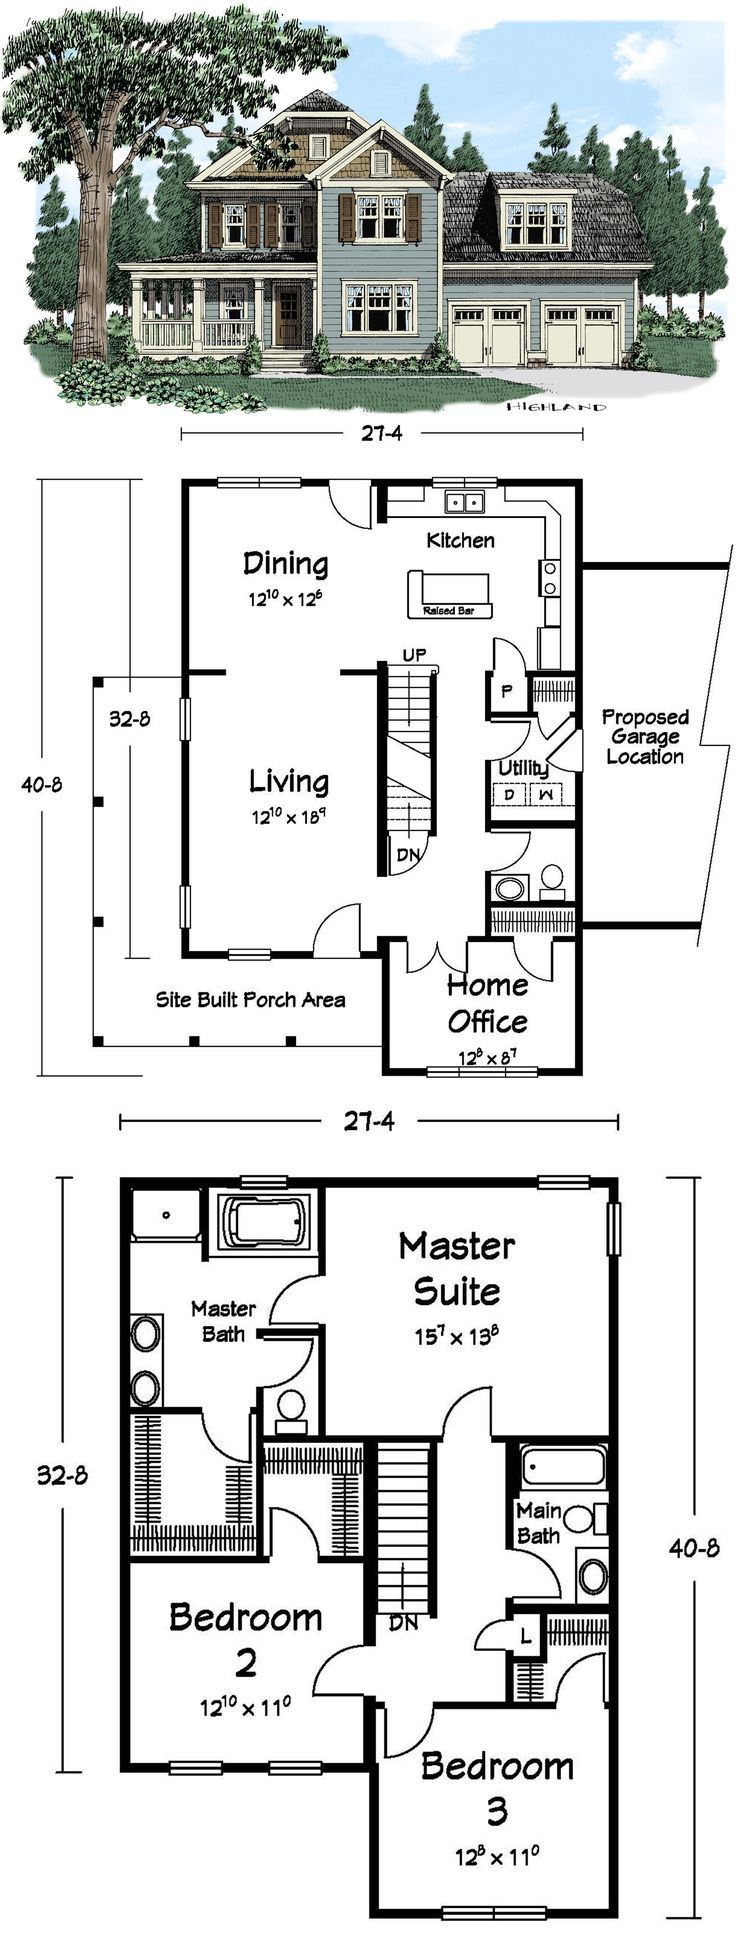 10+ Great Ideas for Modern Barndominium Plans